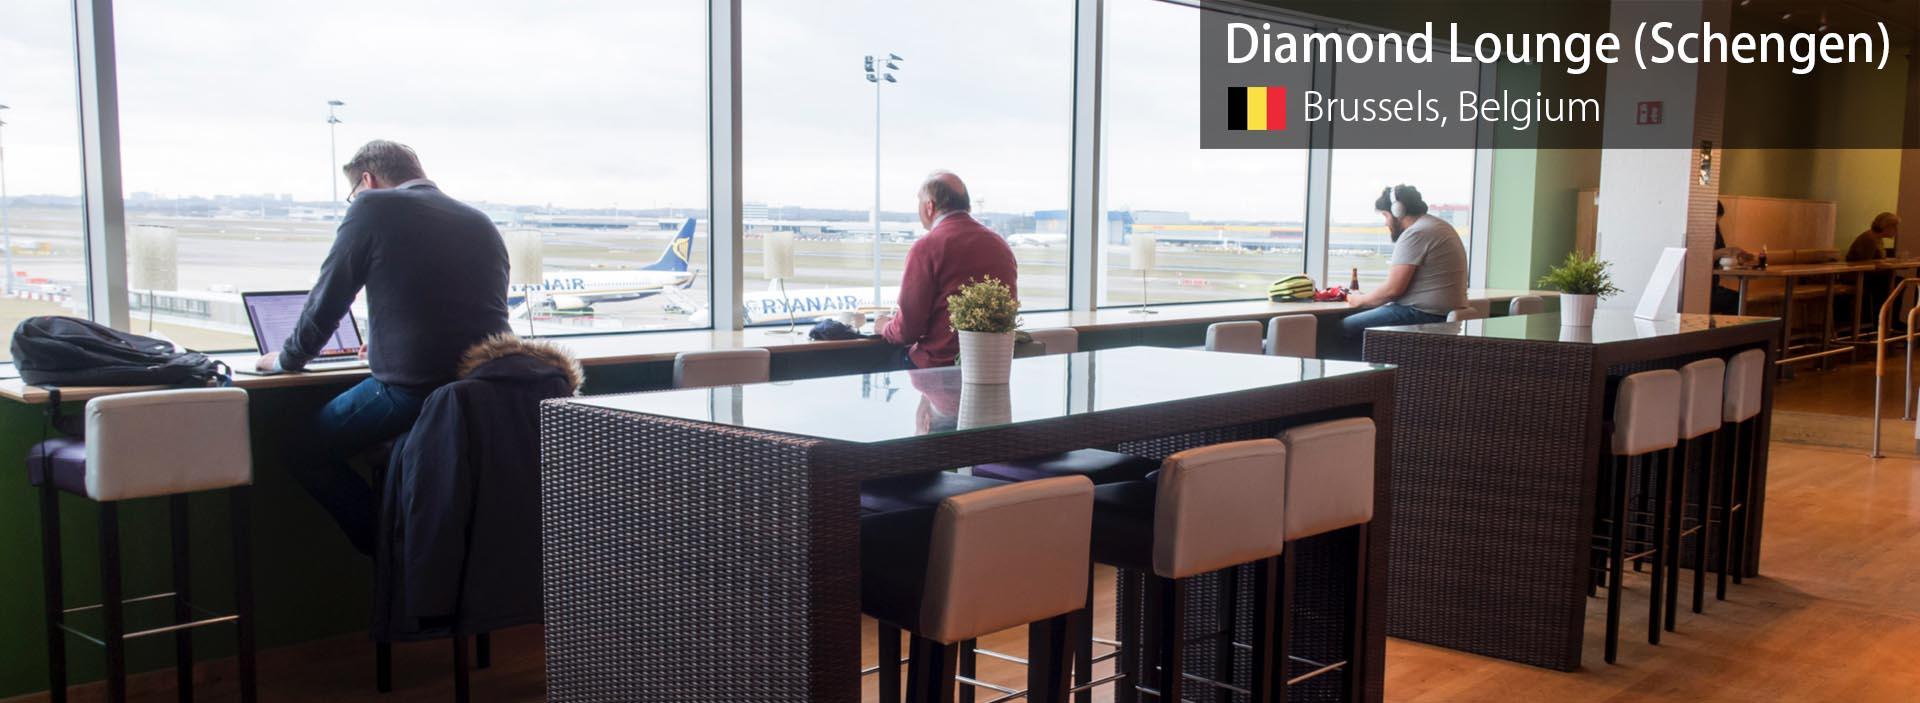 Review: Diamond Lounge (Schengen) at Brussels Airport